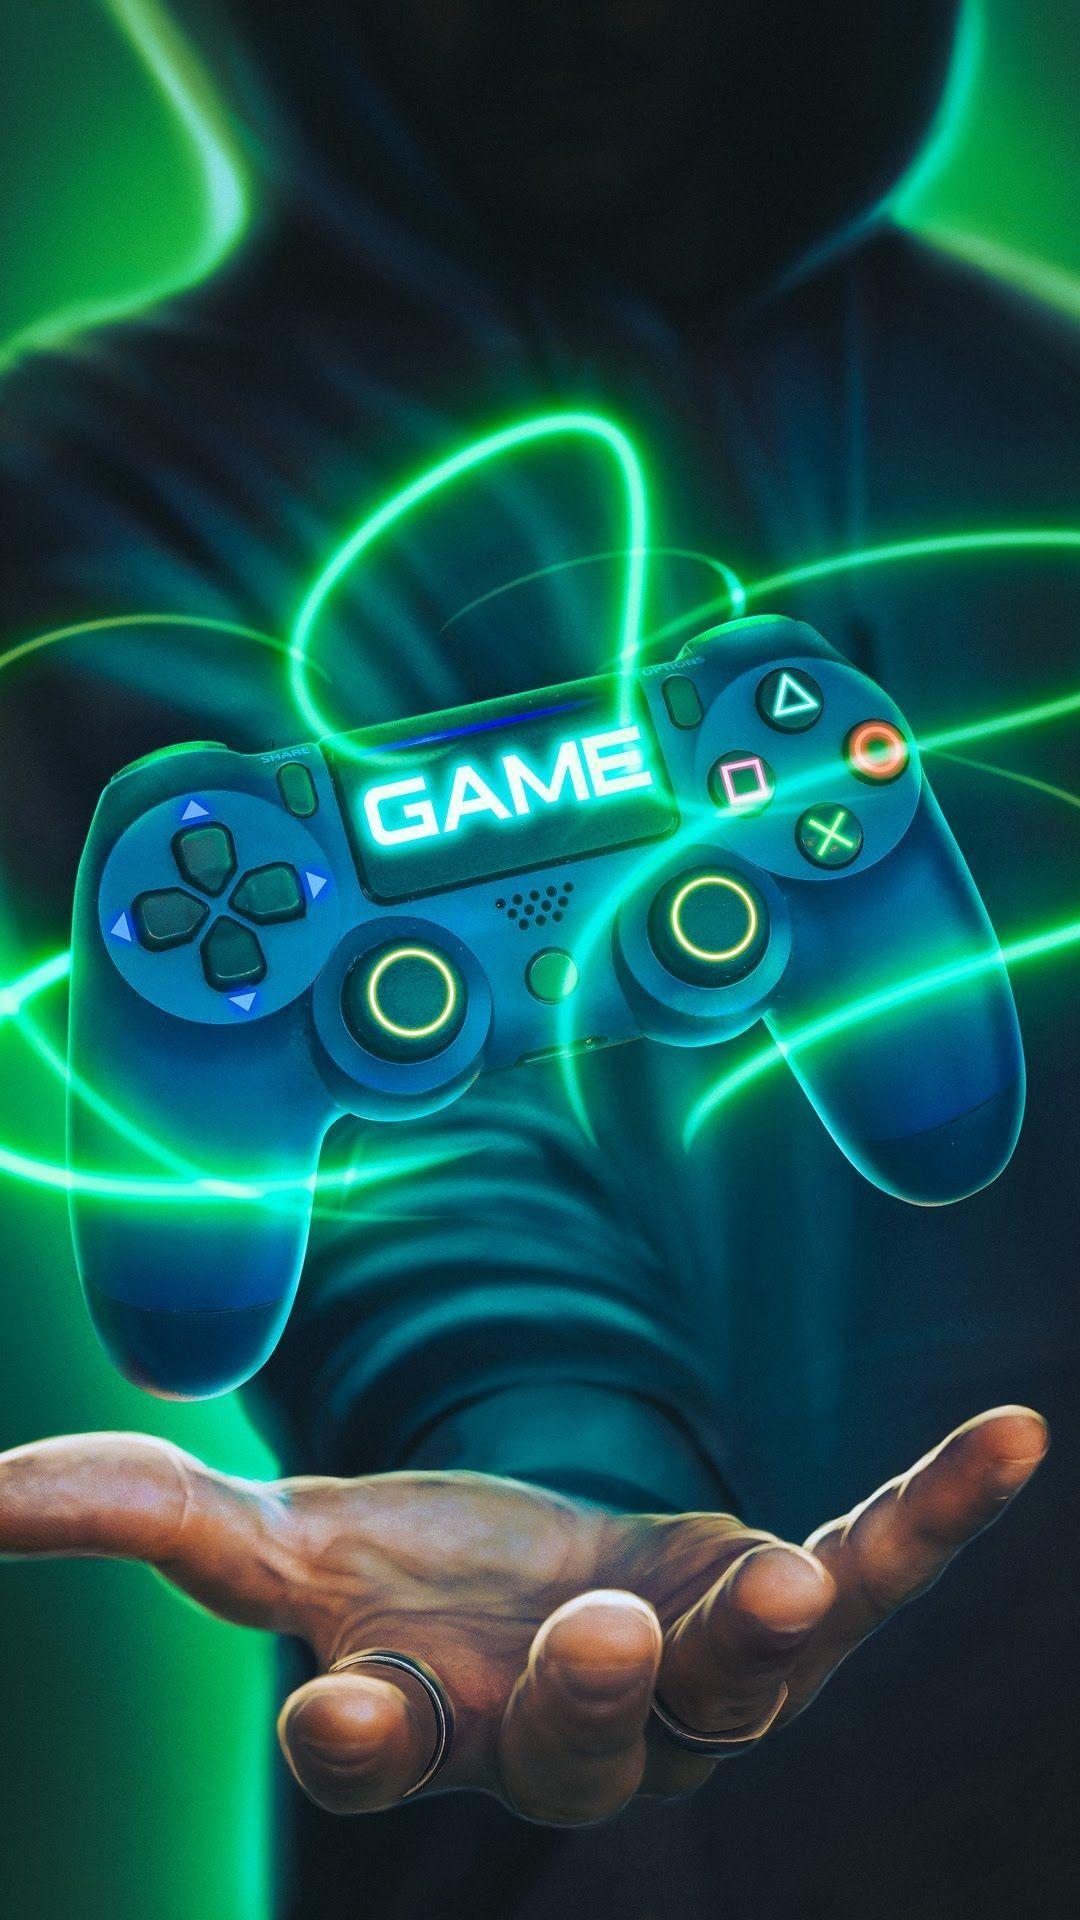 Gamer hd wallpapers download in 2020